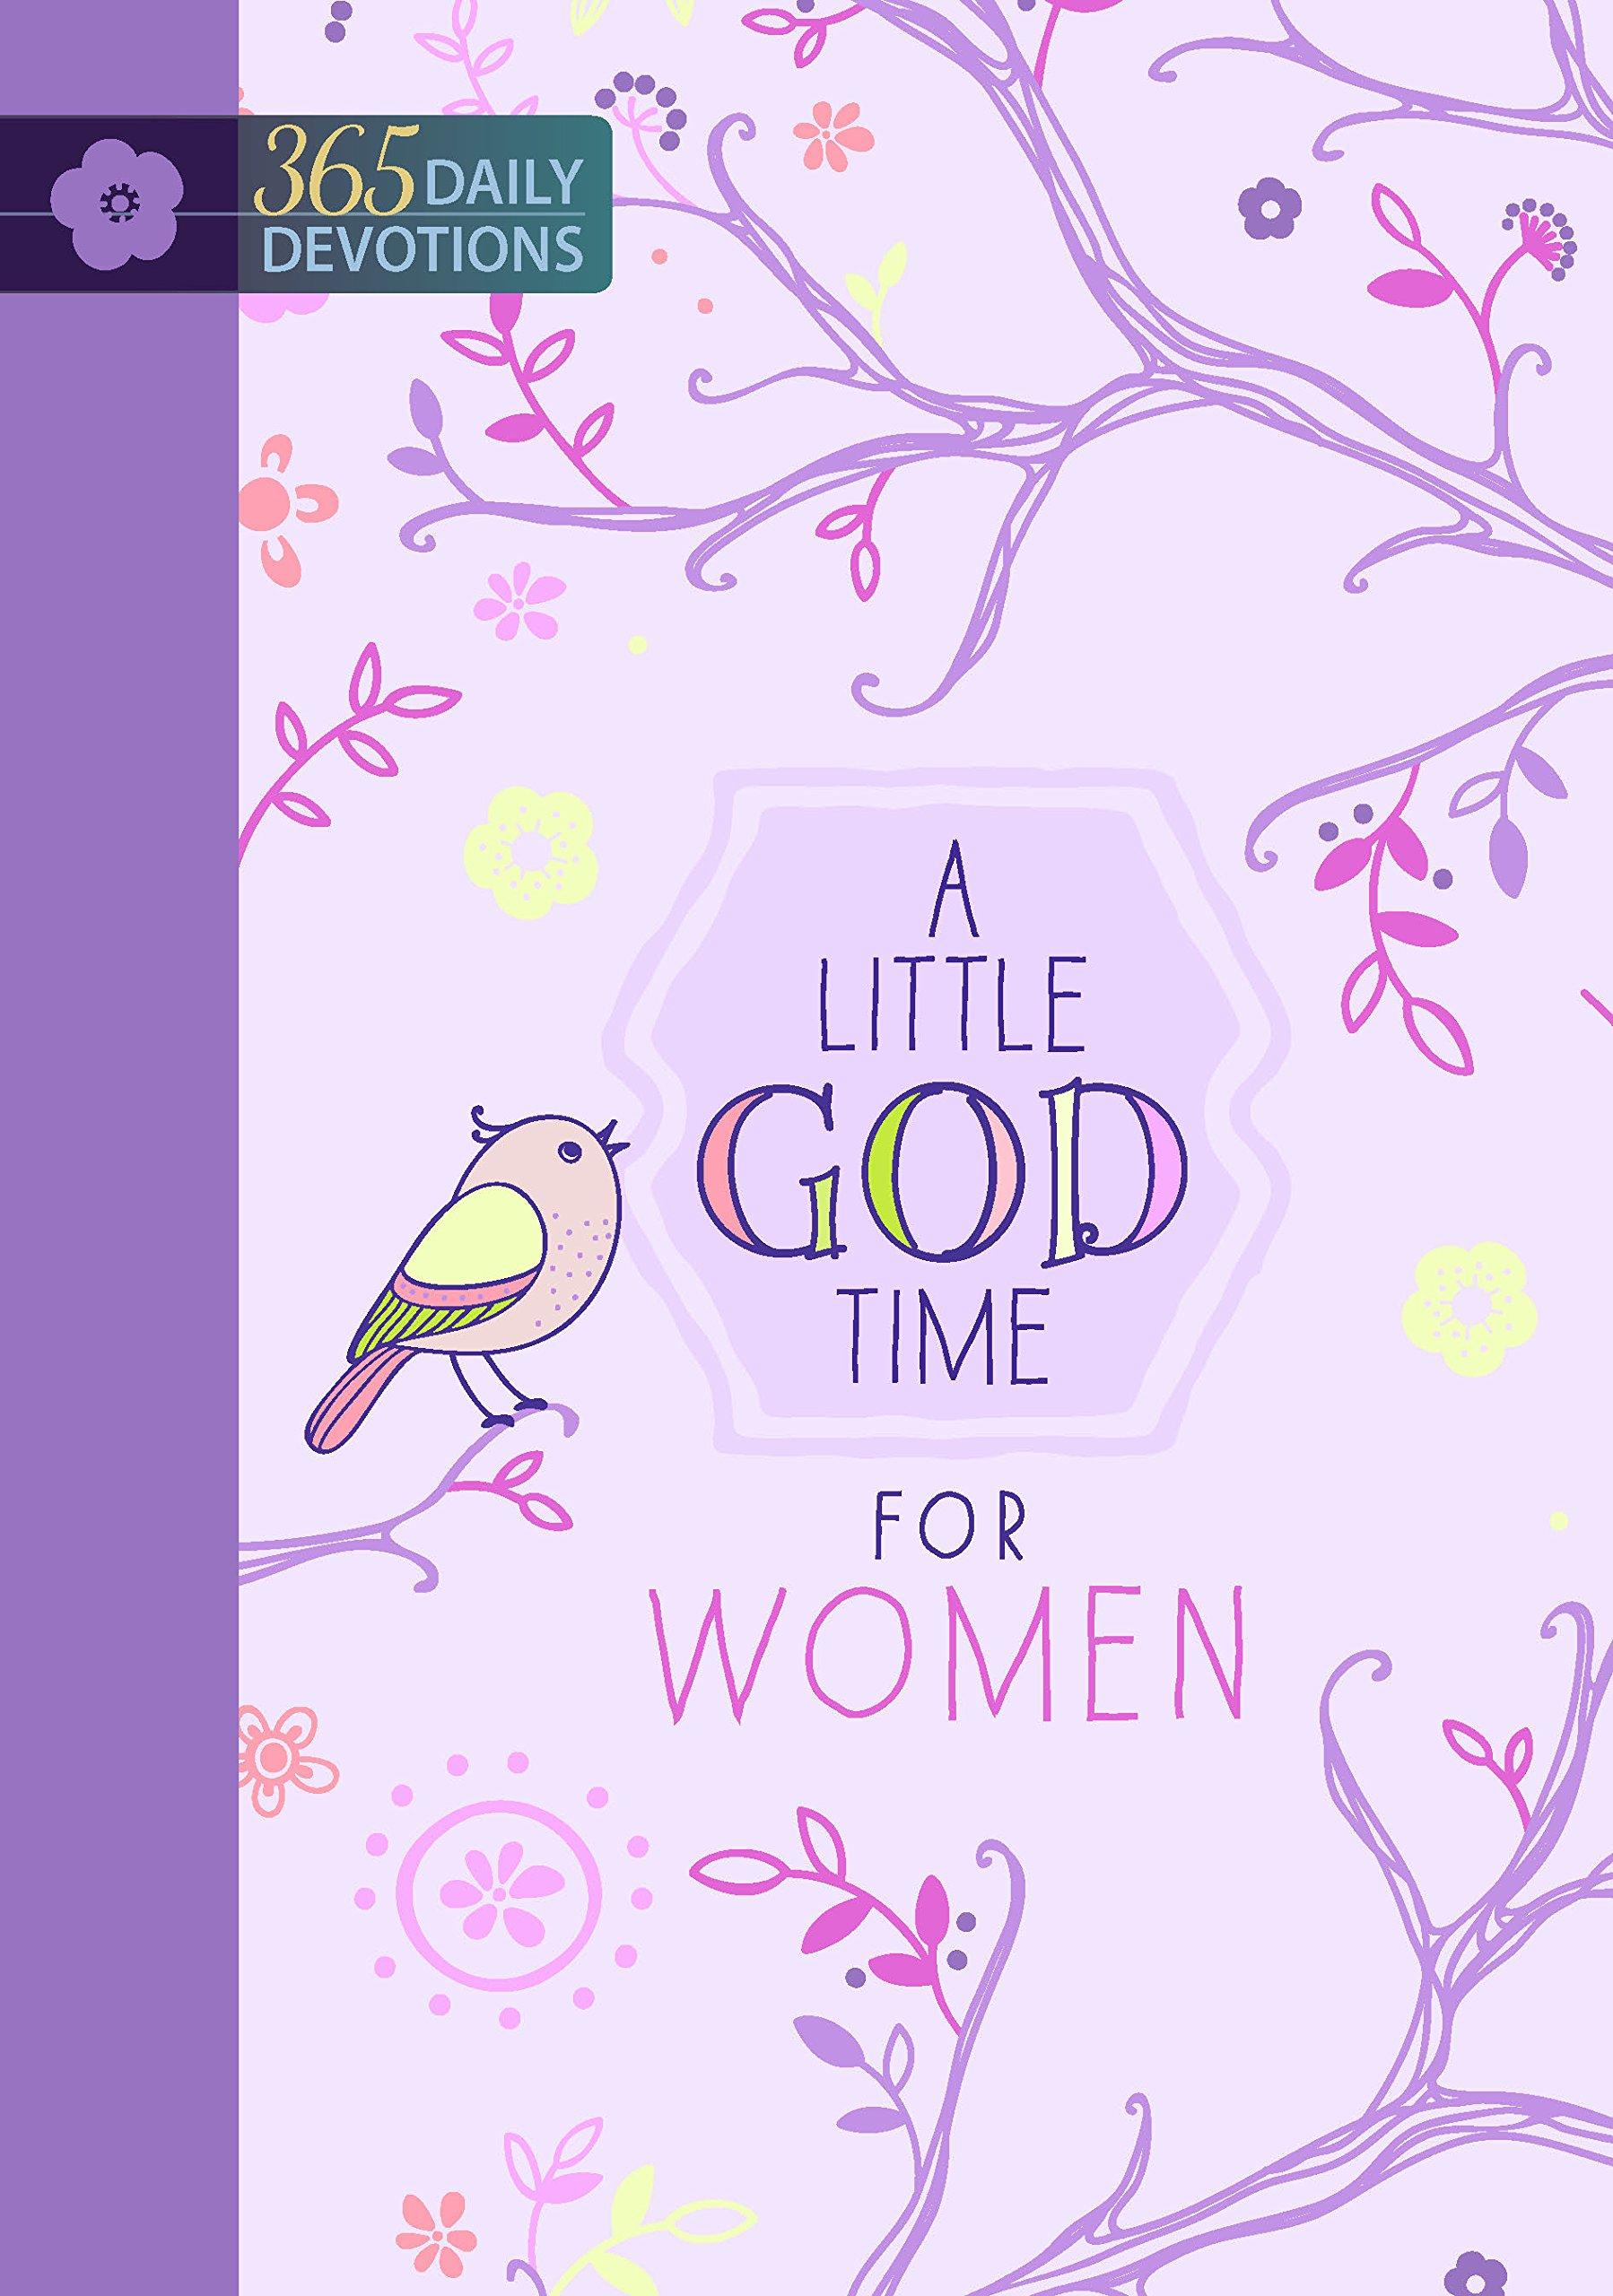 Little God Time Women Devotions product image